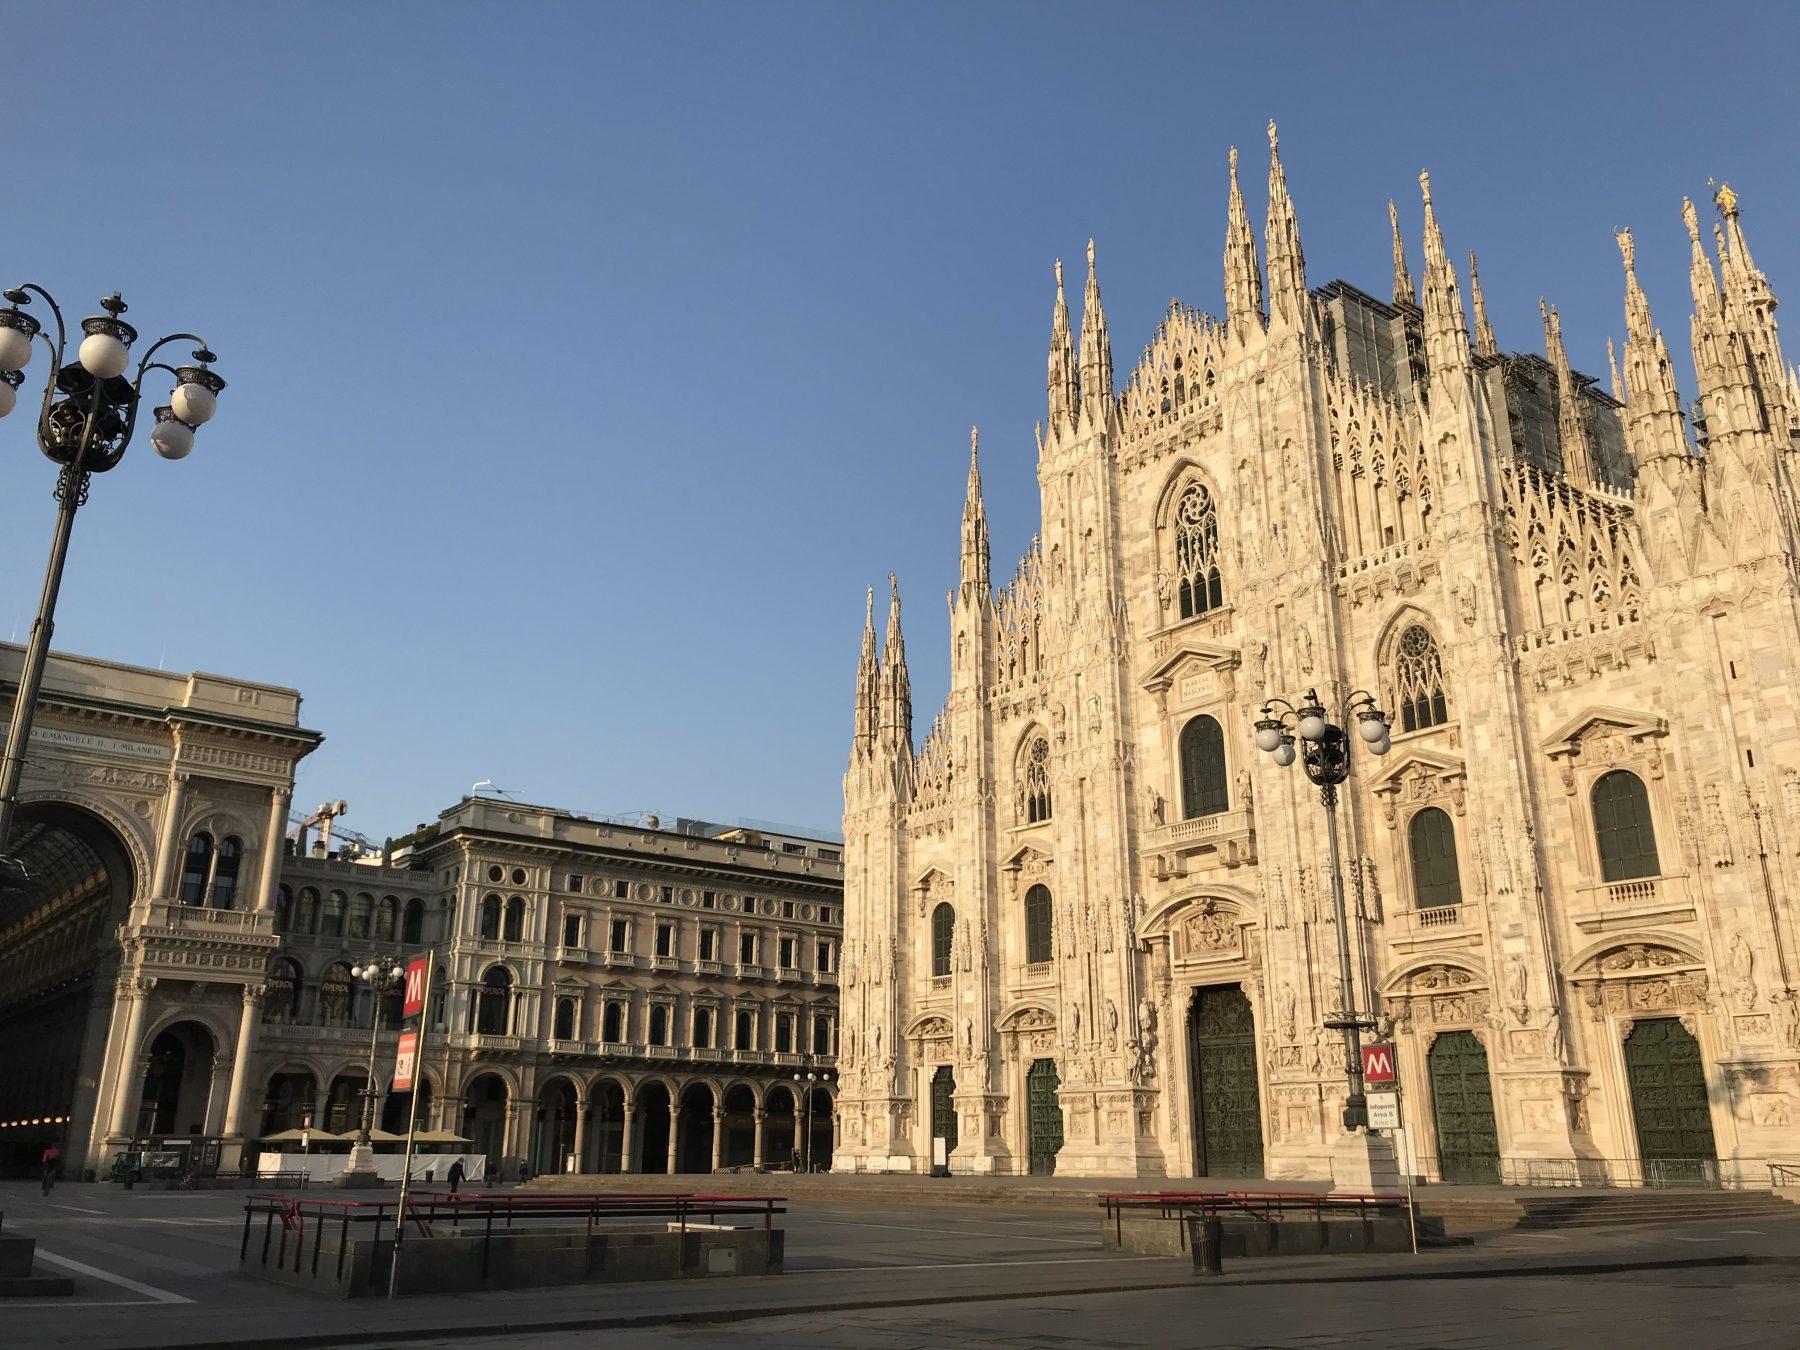 Piazza Duomo milano